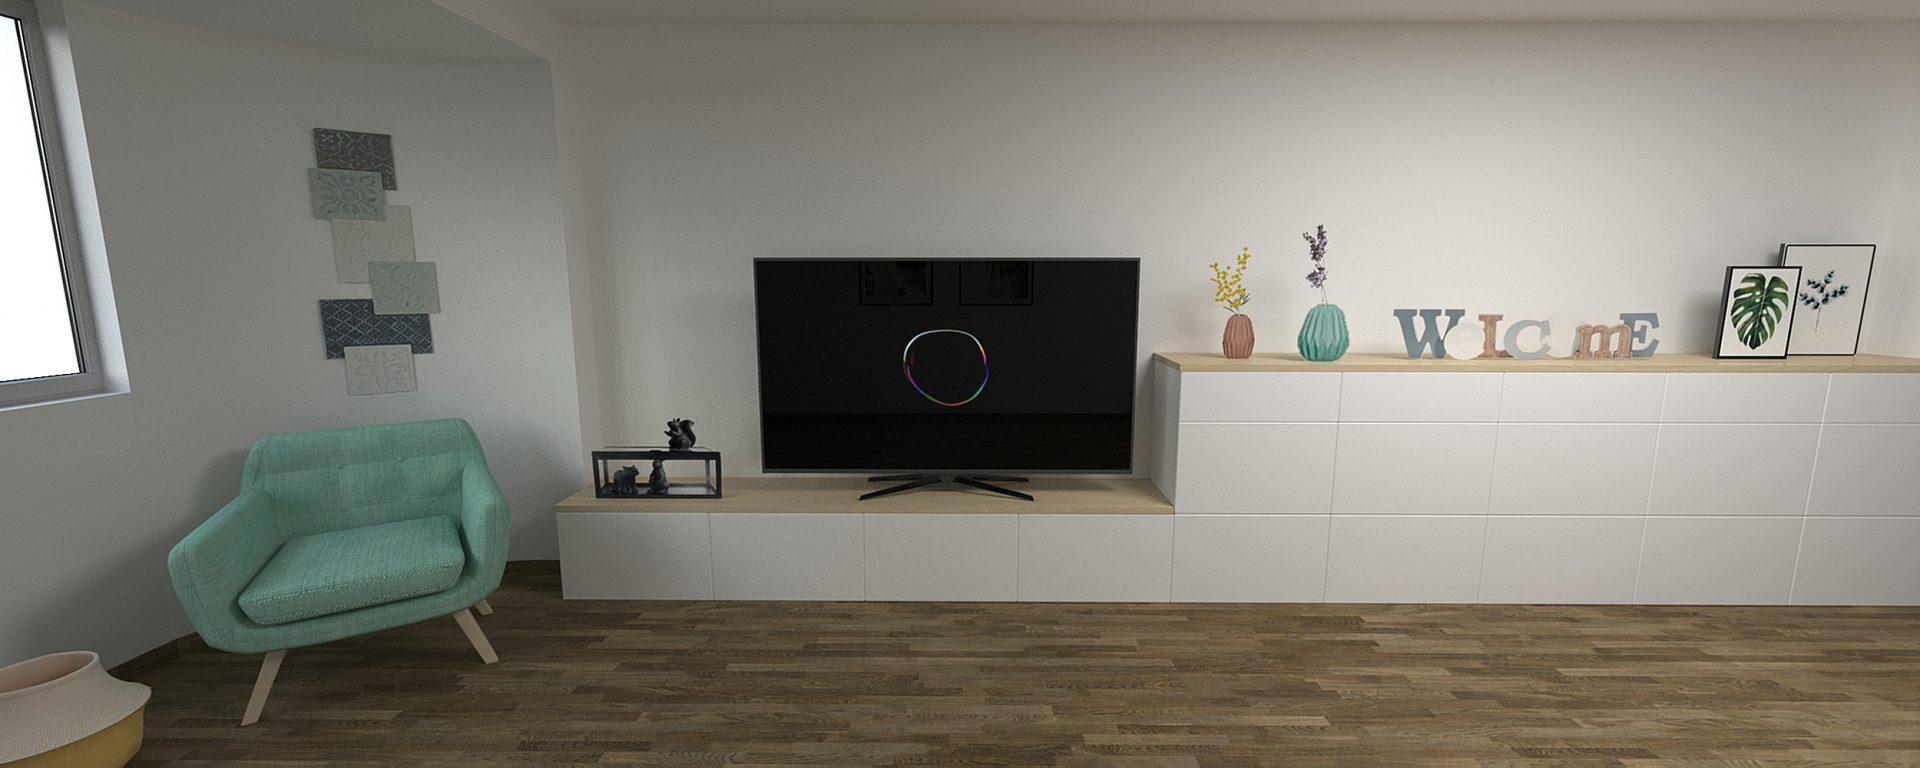 Salon blanco y madera stunning saln moderno en blanco y for Salon blanco y madera